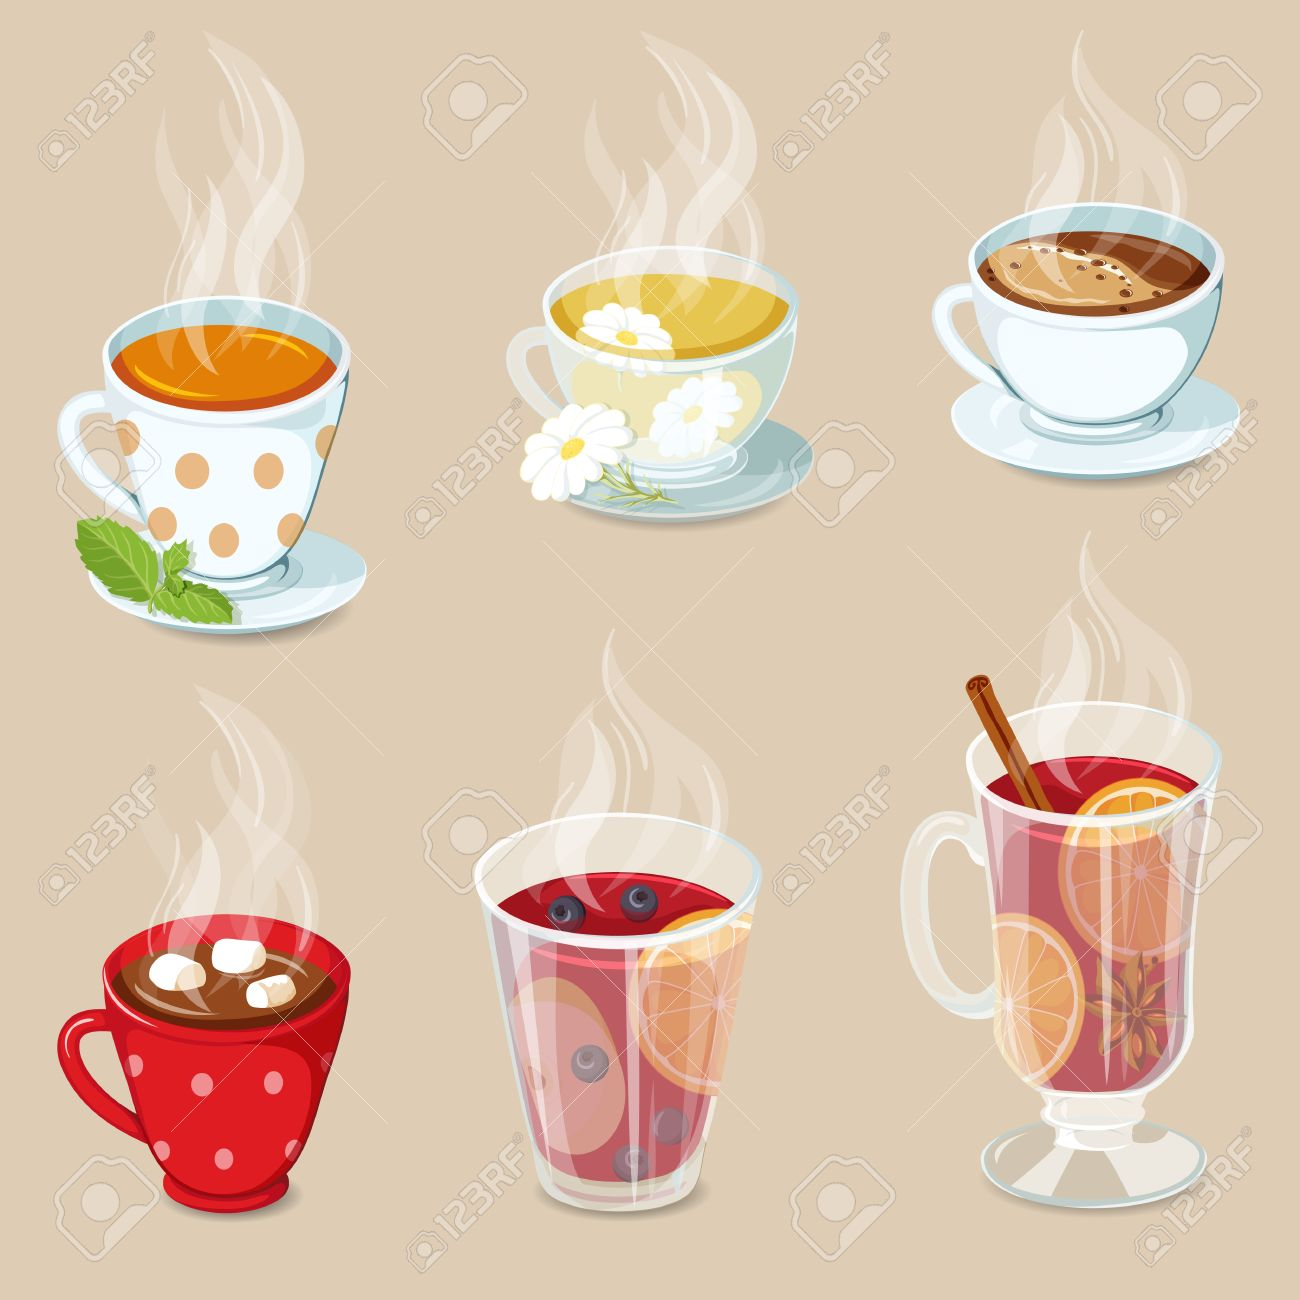 Heiße Getränke-Icons Gesetzt. Kakao Mit Marshmallows, Tee, Kaffee ...